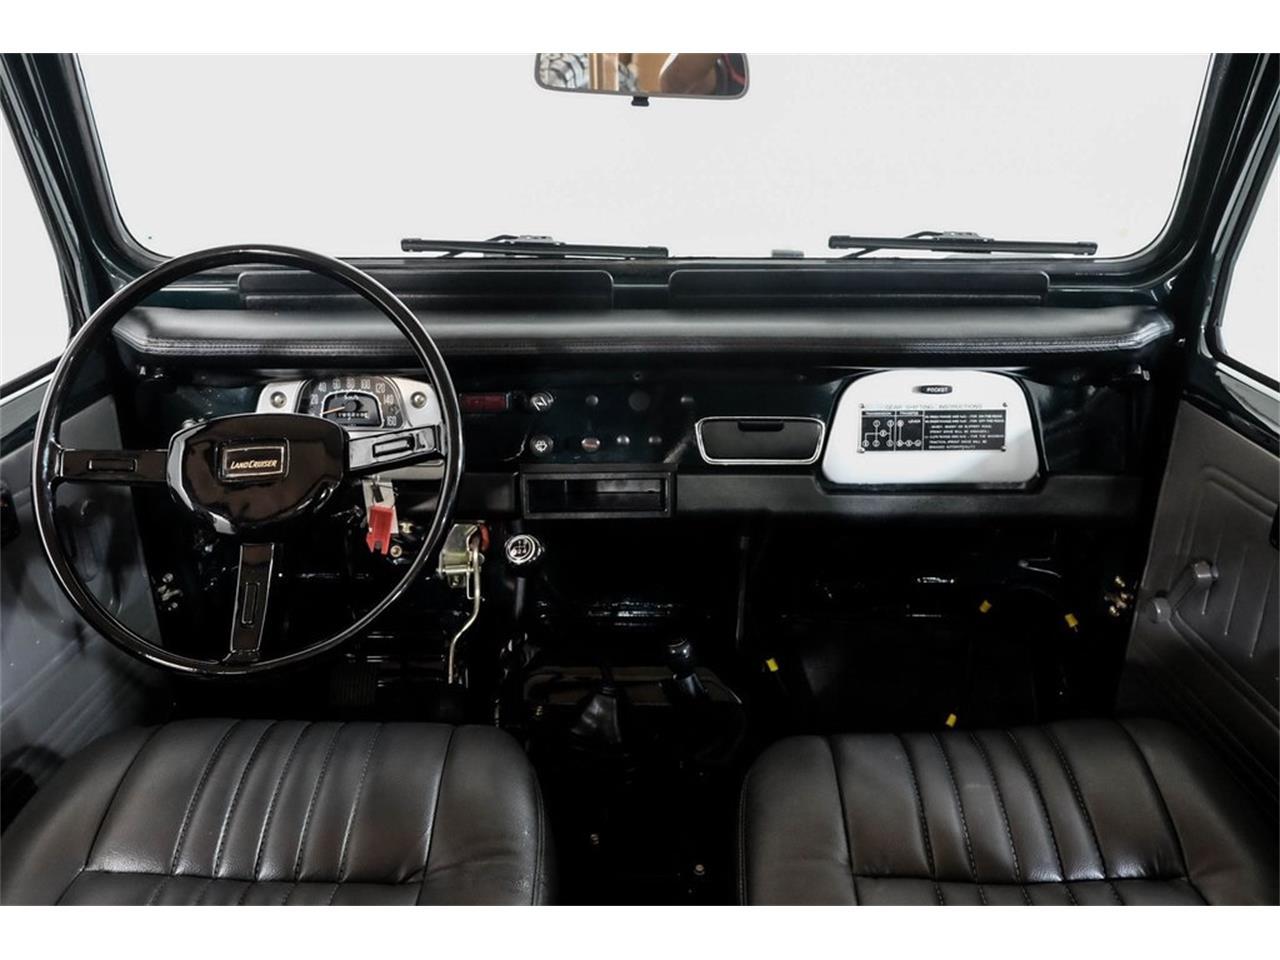 1981 Toyota Land Cruiser FJ (CC-1294136) for sale in Carrollton, Texas